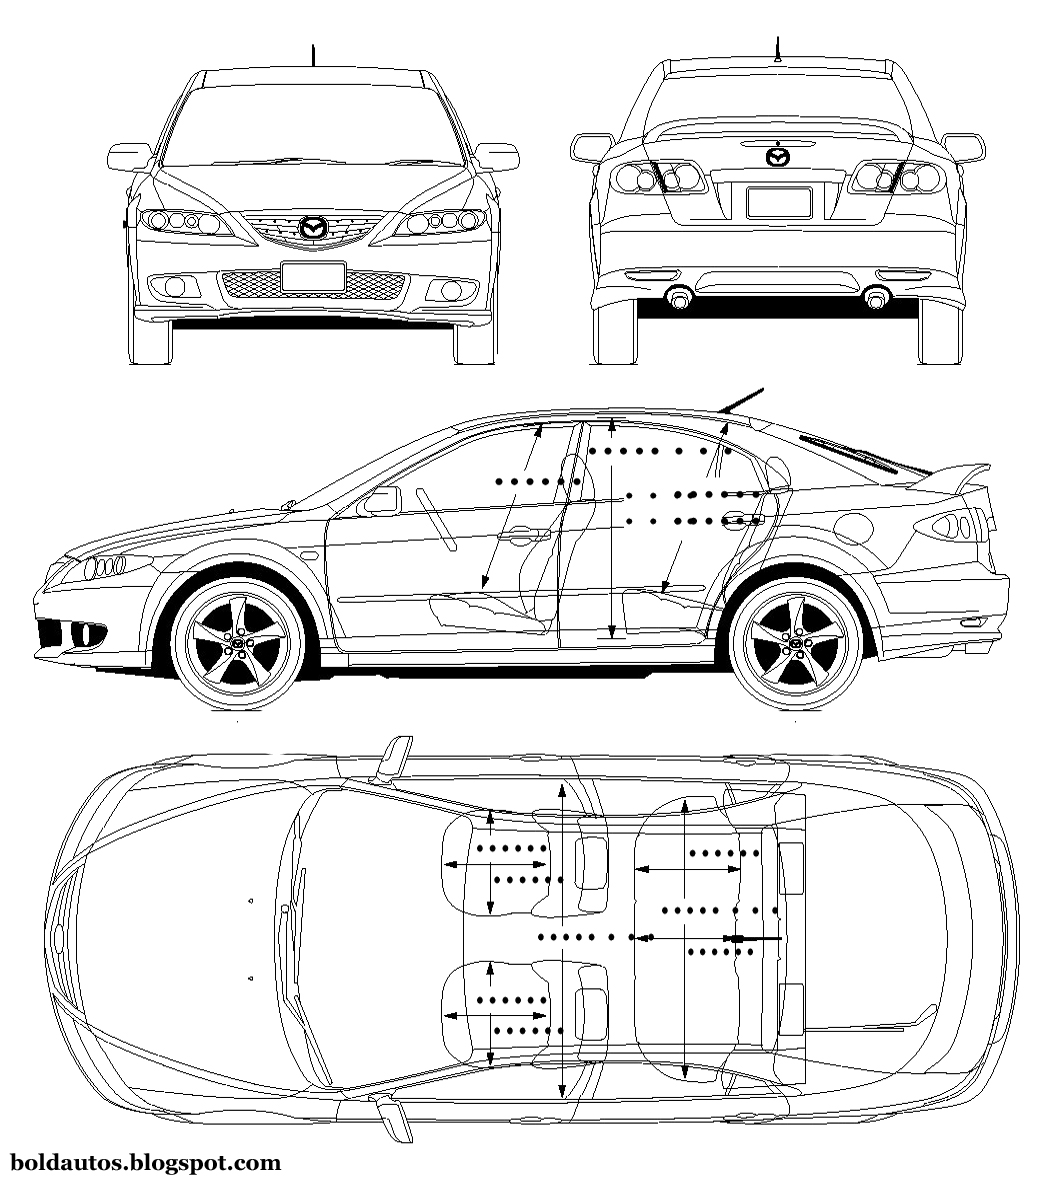 Bold Autos: Mazda Atenza